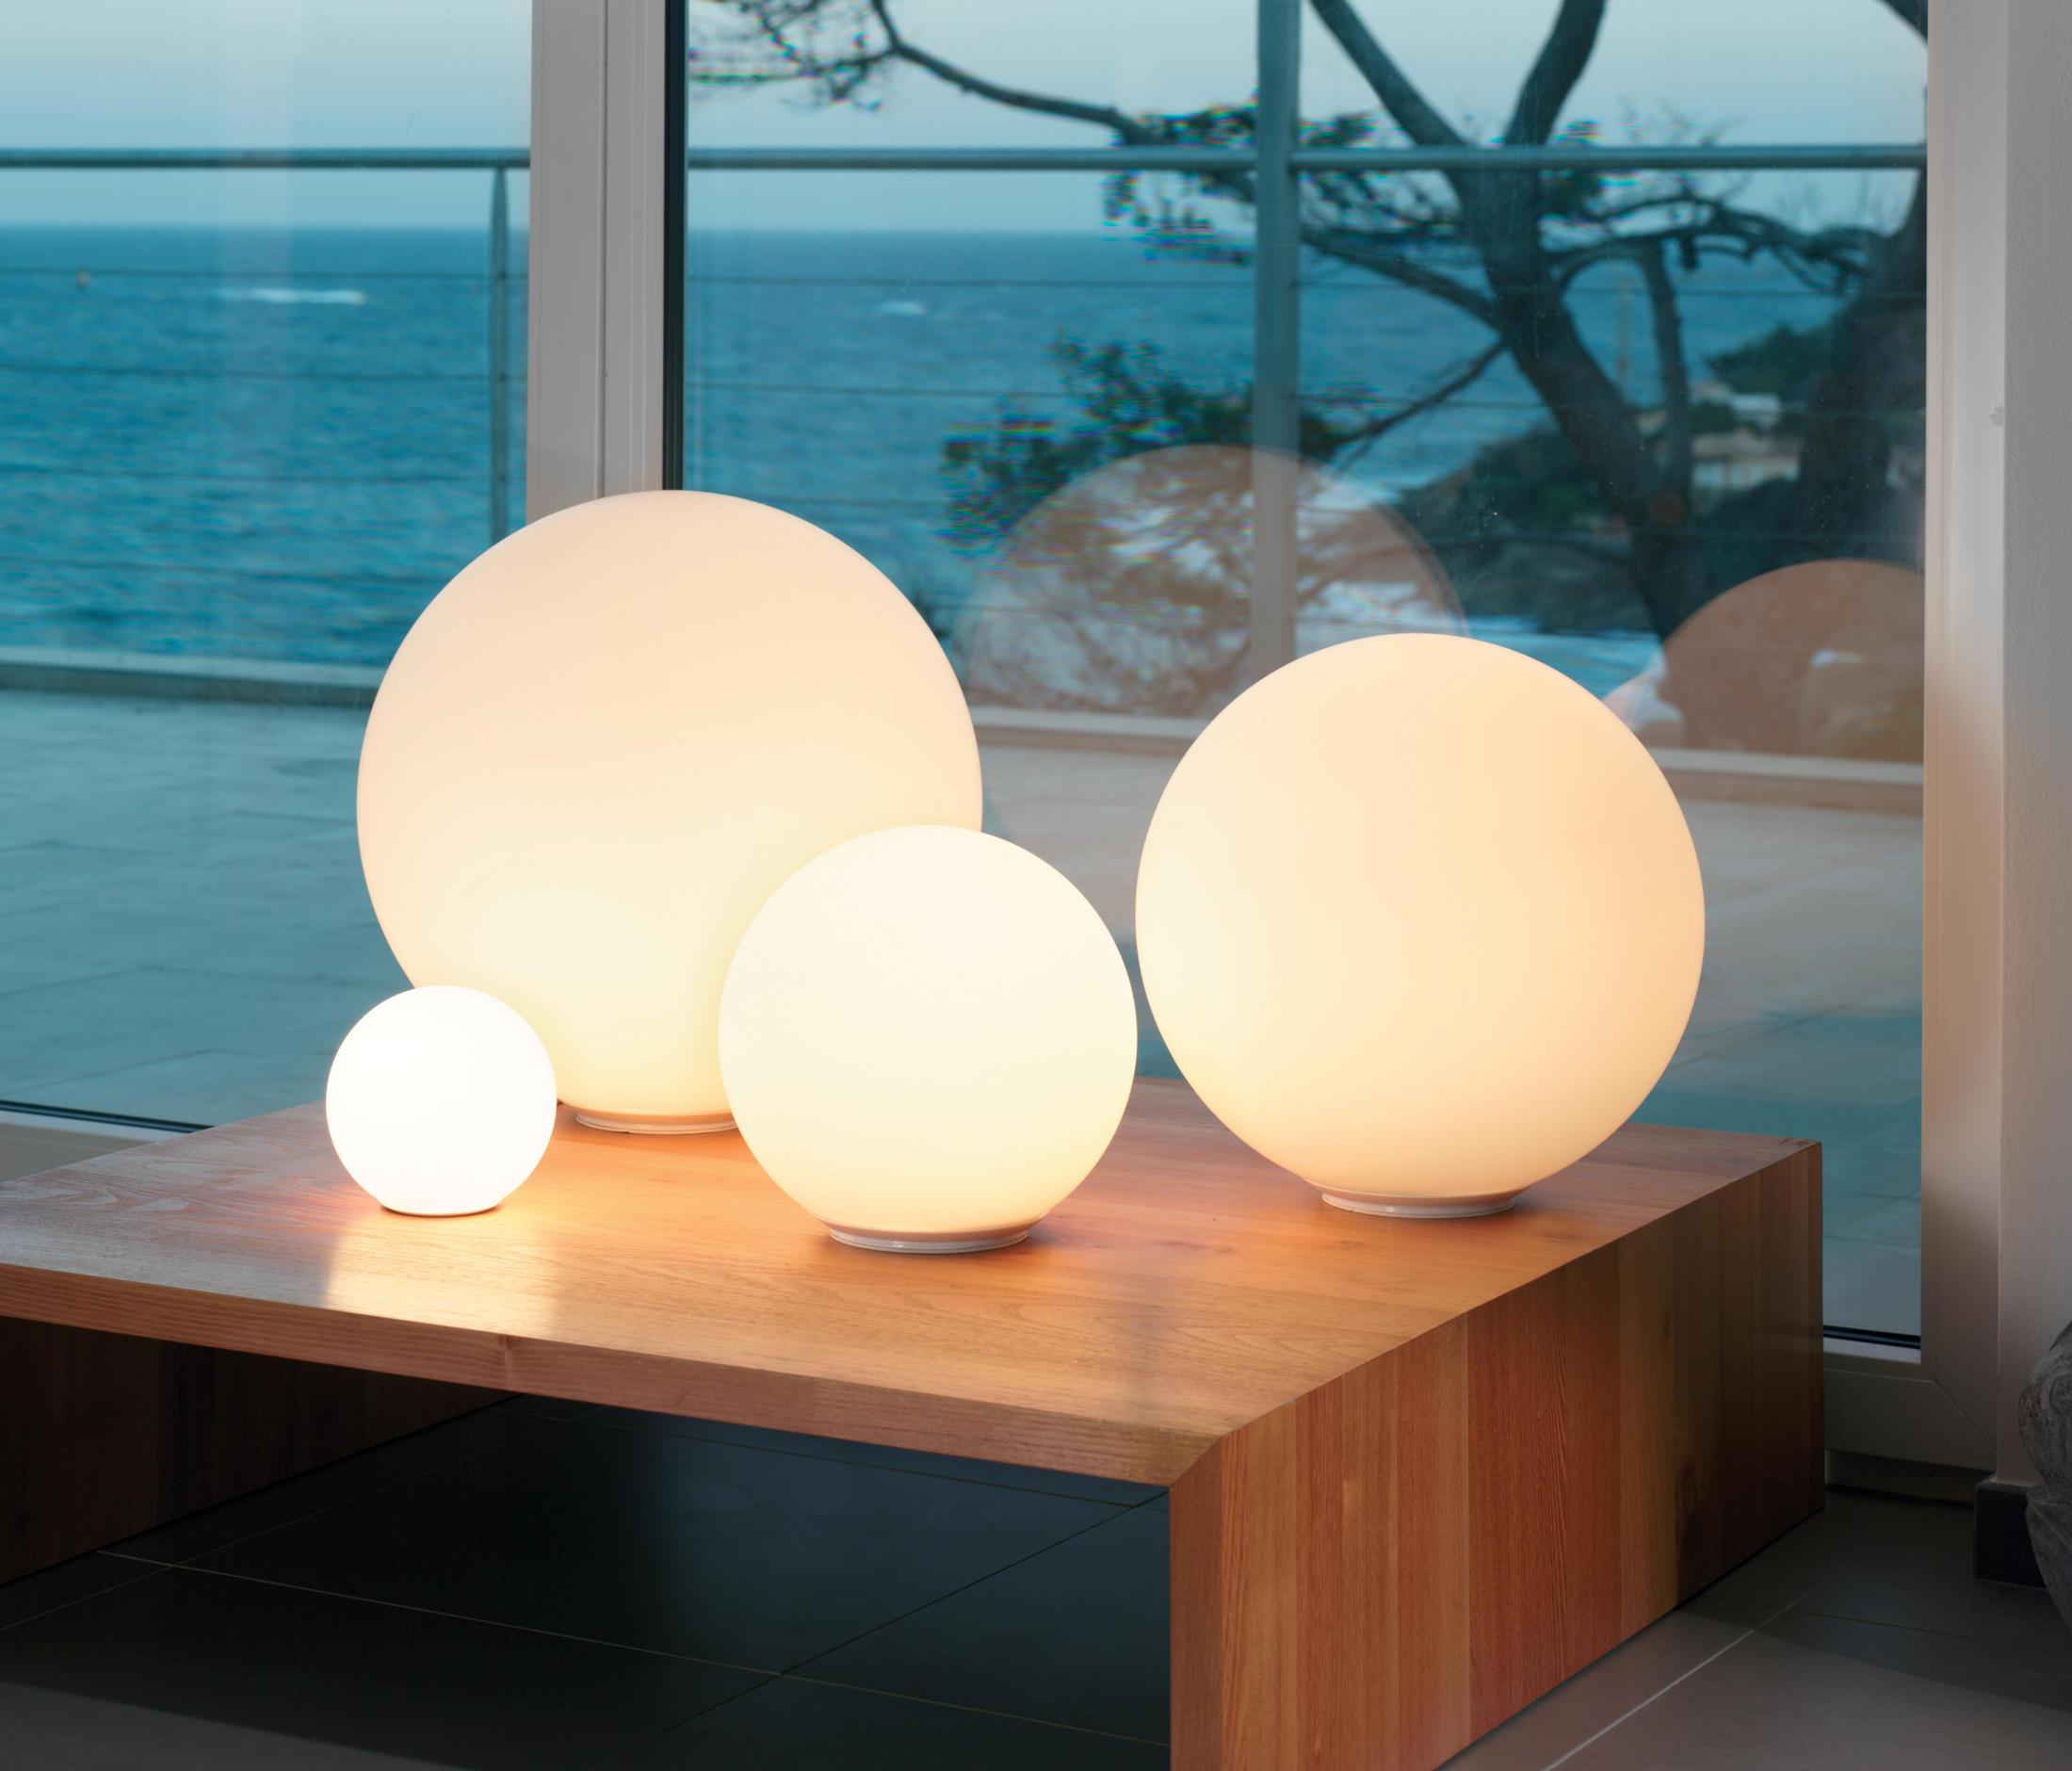 dioscuri lampe de table clairage g n ral de artemide architonic. Black Bedroom Furniture Sets. Home Design Ideas